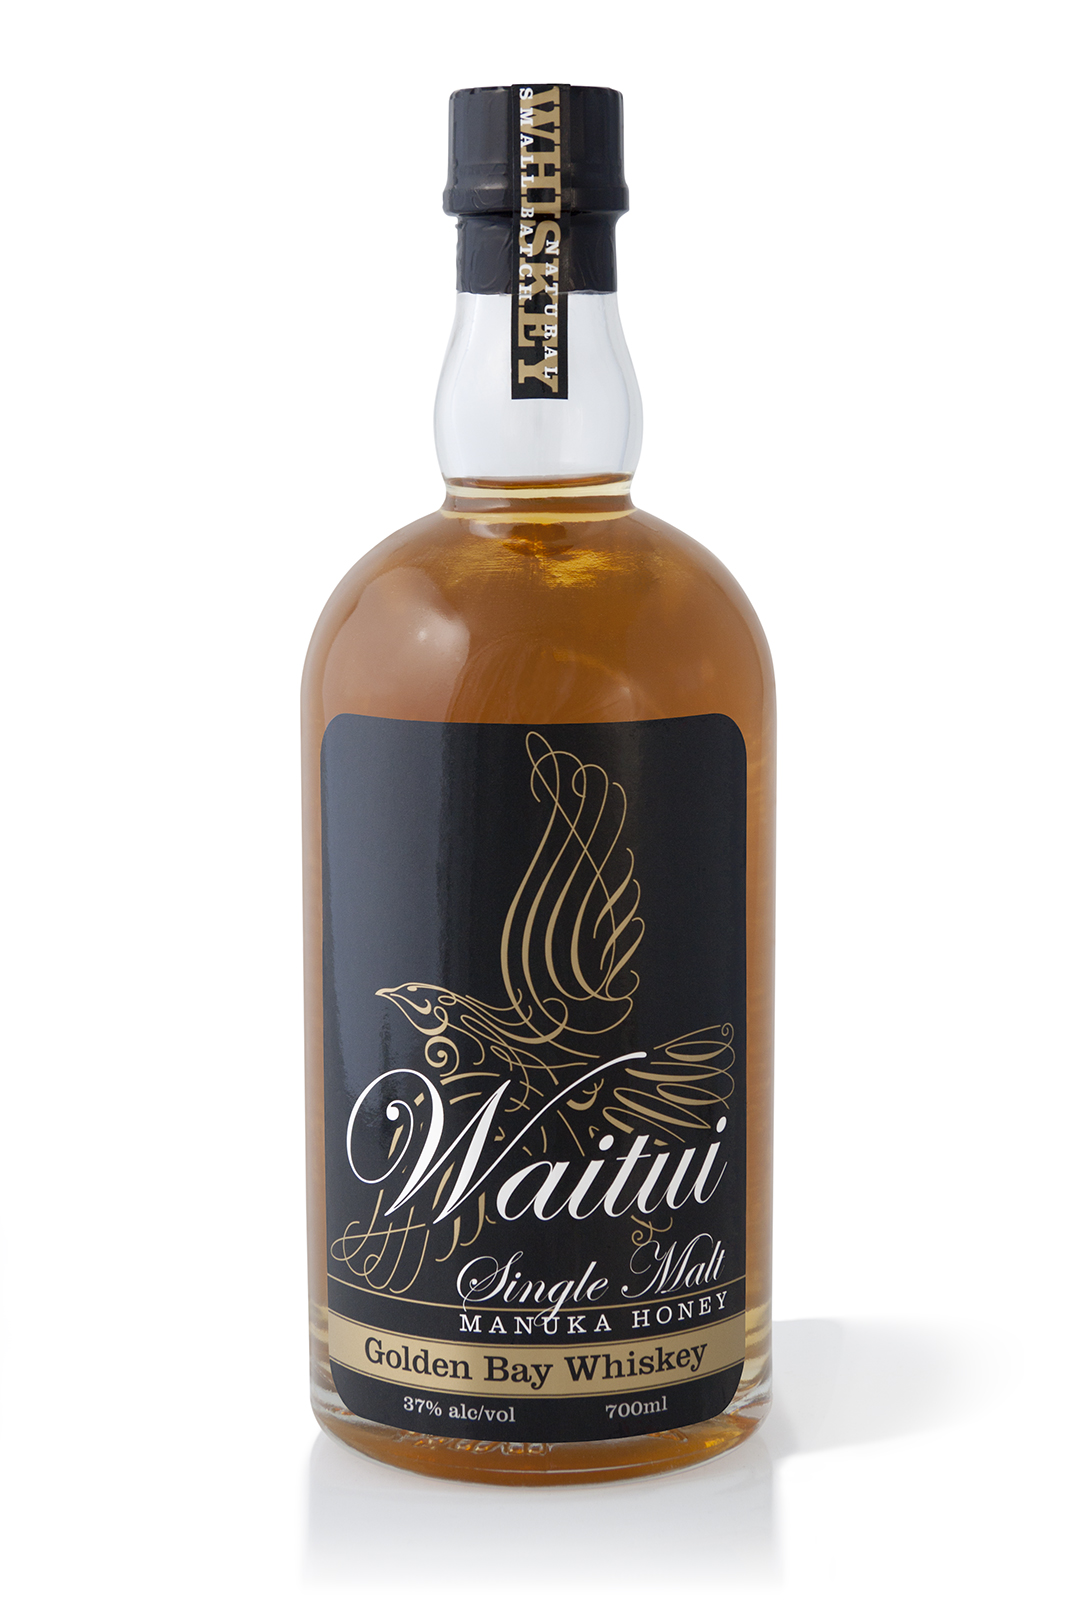 Waitui Single Malt Manuka Honey Golden Bay Whiskey packaging label